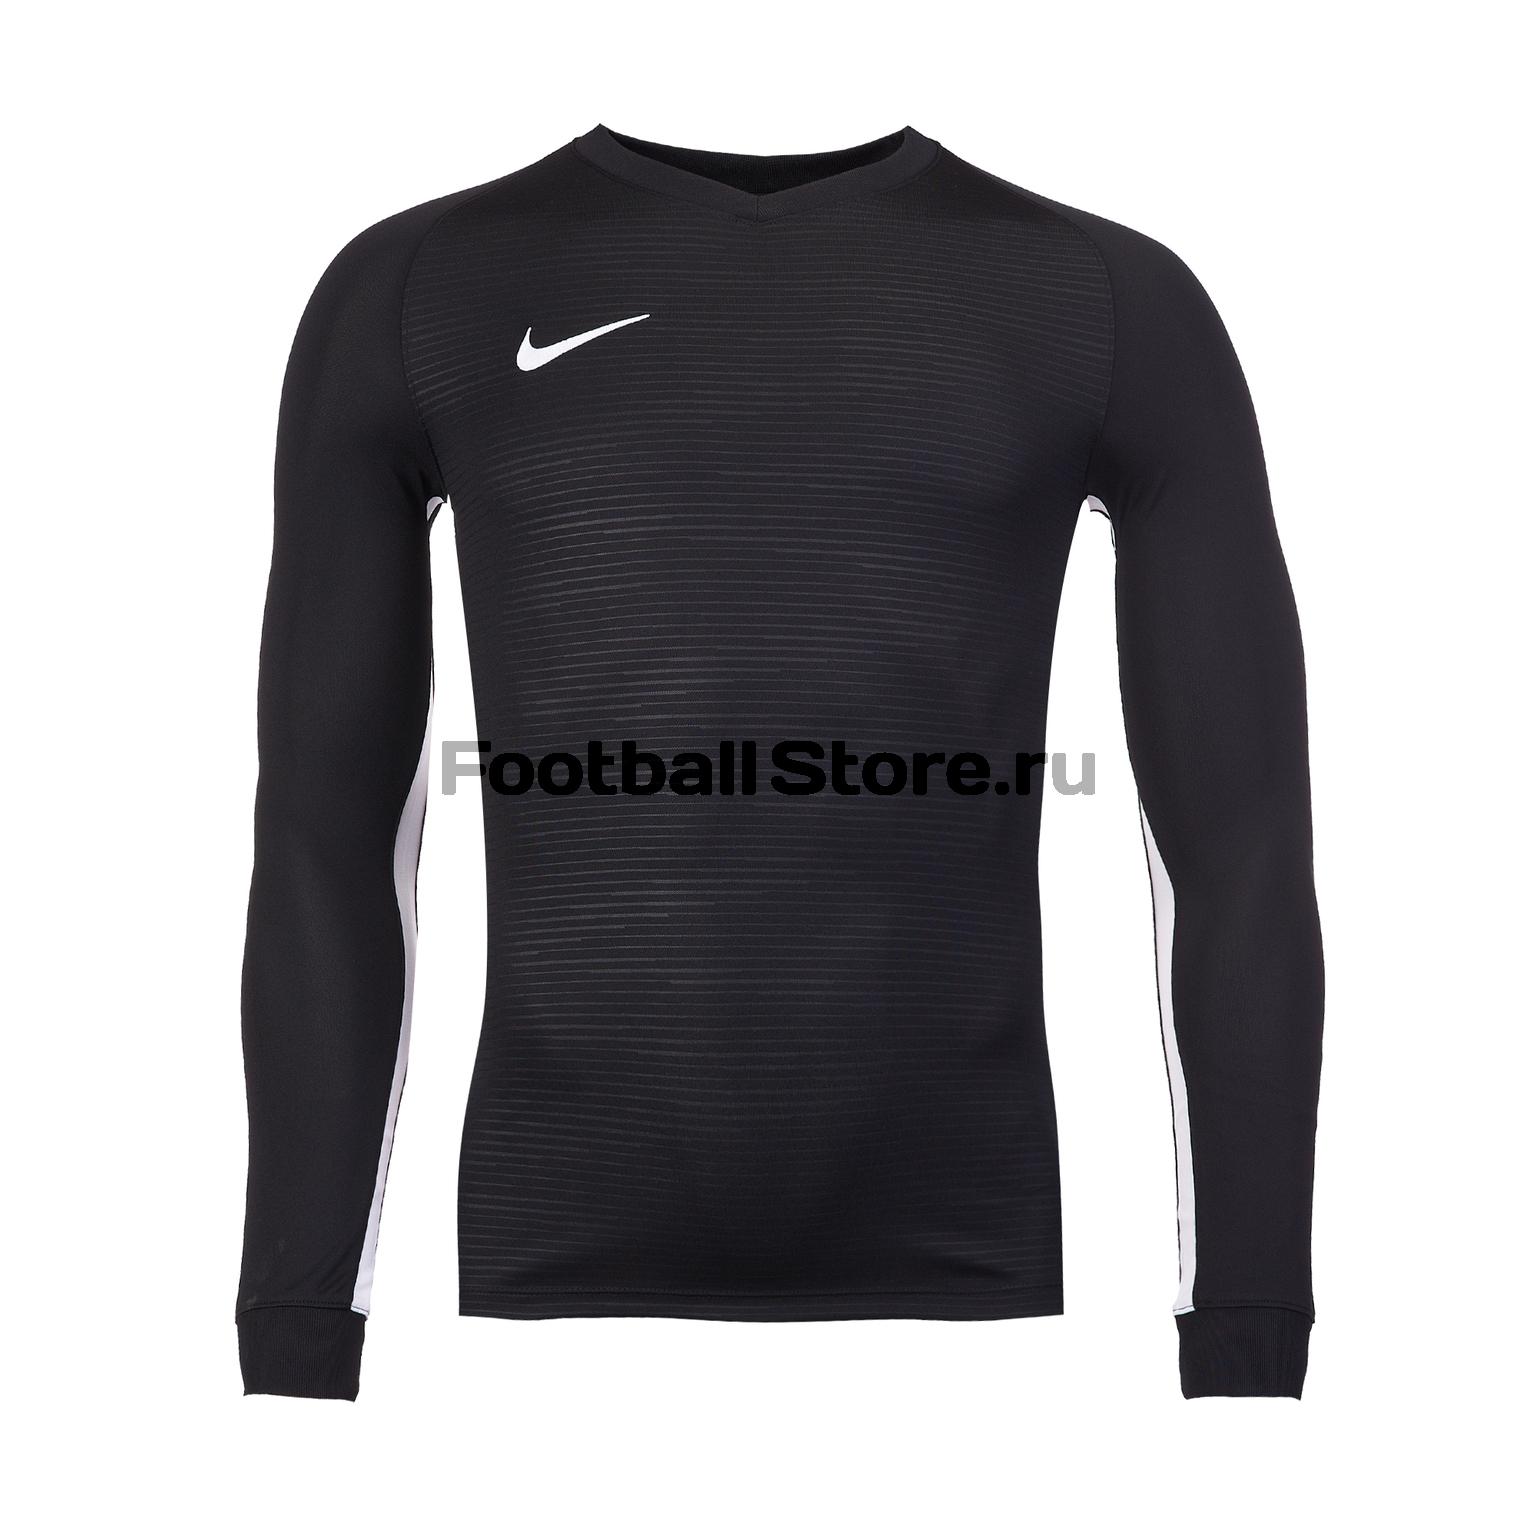 Футболка игровая Nike Dry Tiempo Prem JSY LS 894248-010 футболка игровая nike dry tiempo prem jsy ss 894230 010